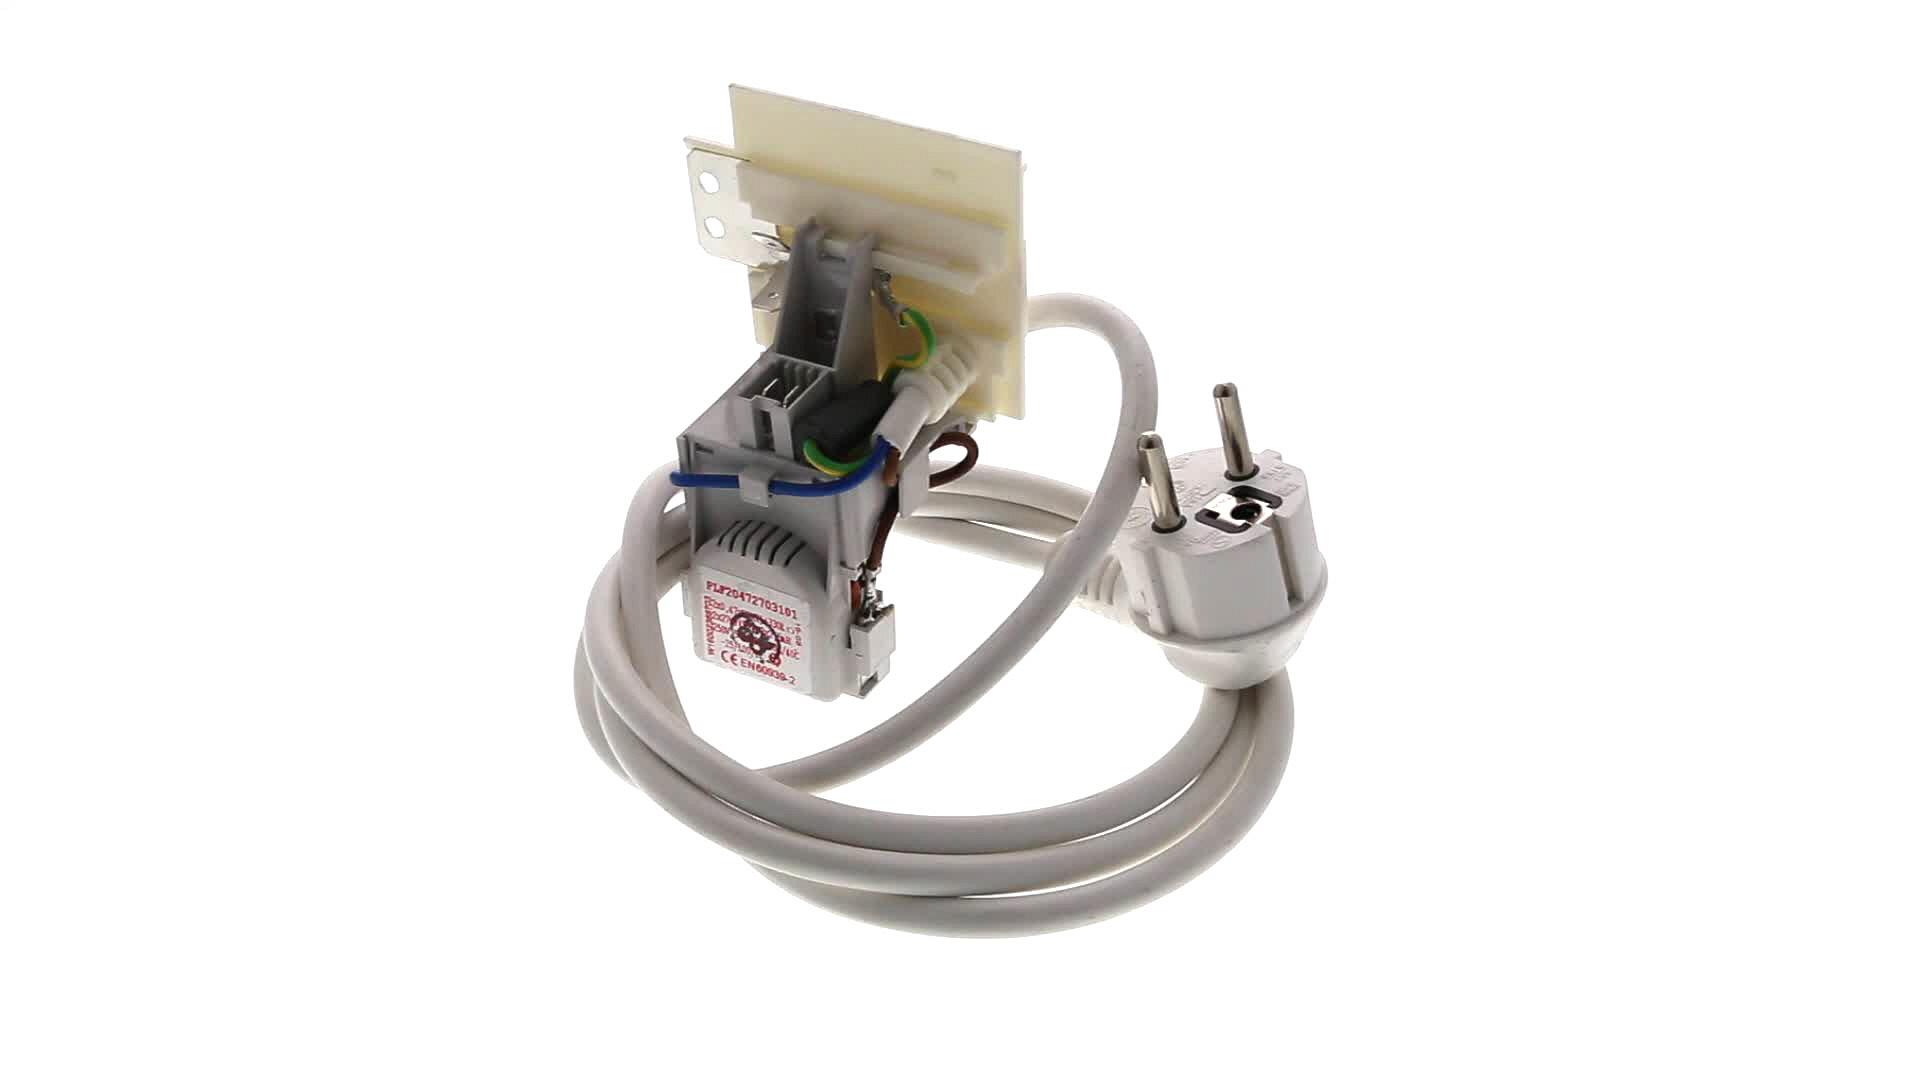 CONDO LAVE-LINGE ANTIPARASITE 444680430 +CABLE - 2